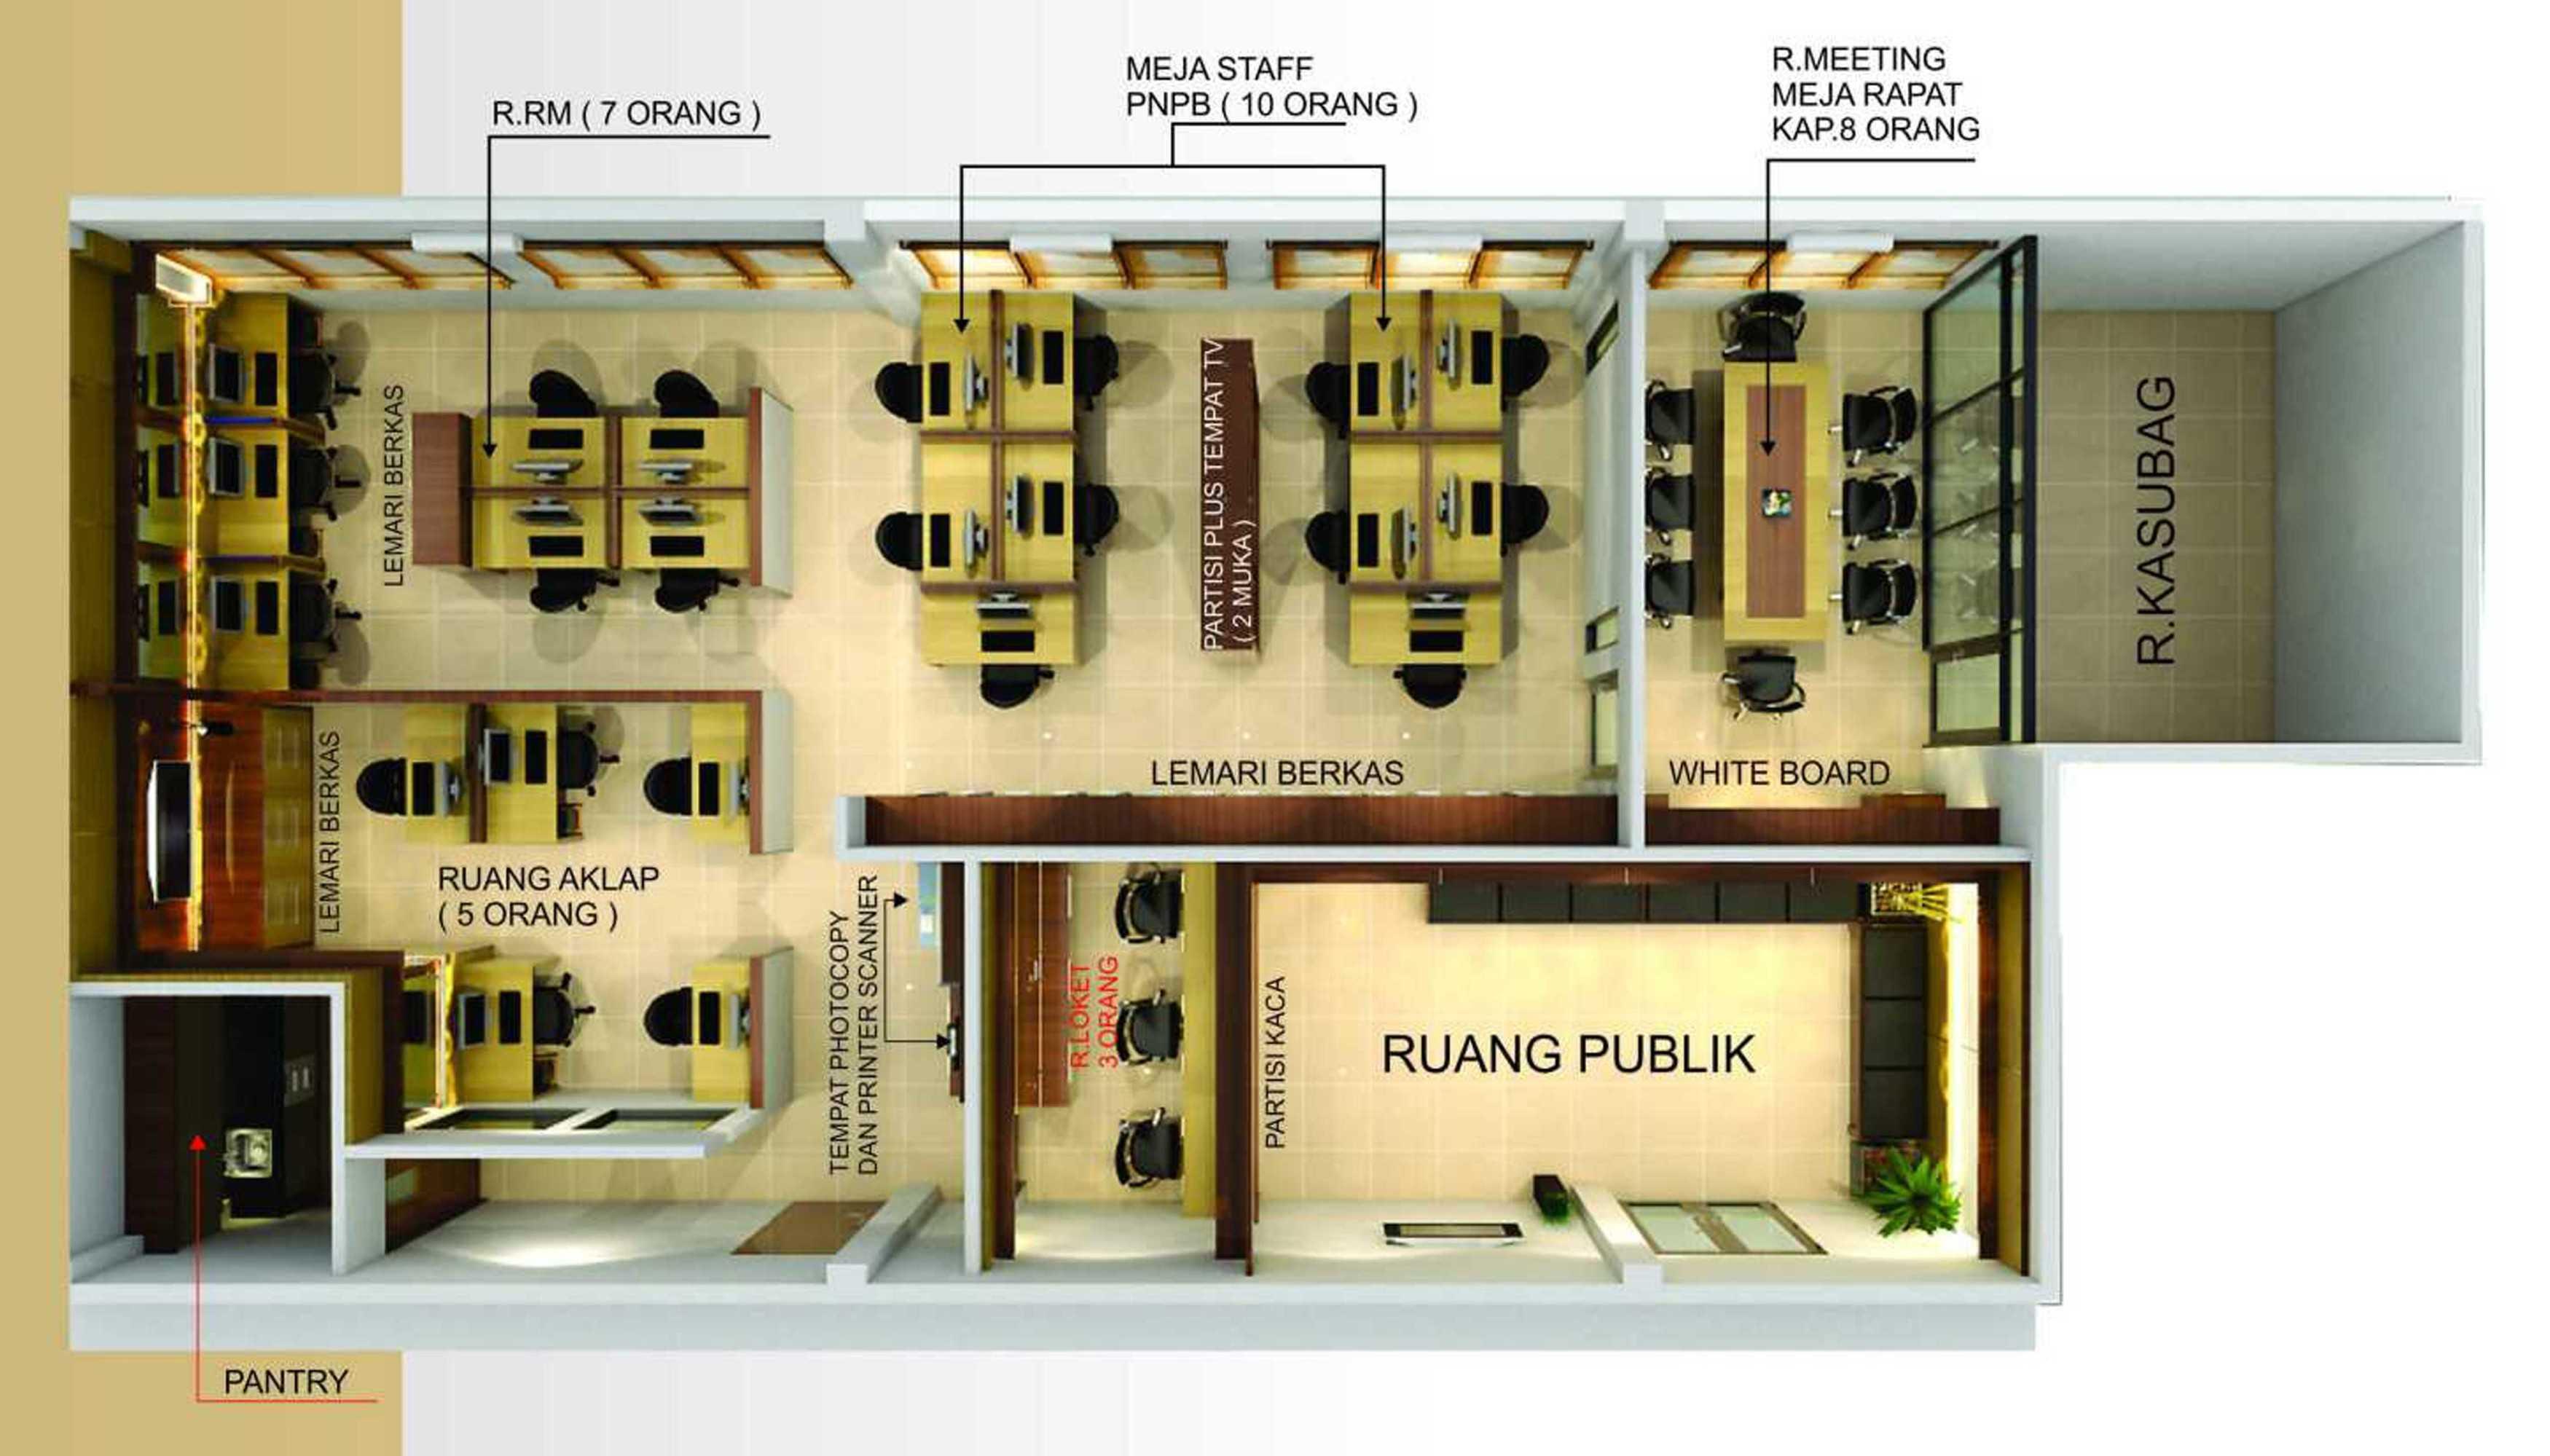 Ofelos Interior Untirta Jl. Raya Jak Km.4, Panancangan, Kec. Serang, Kota Serang, Banten 42124, Indonesia Jl. Raya Jak Km.4, Panancangan, Kec. Serang, Kota Serang, Banten 42124, Indonesia 6 Modern  33023